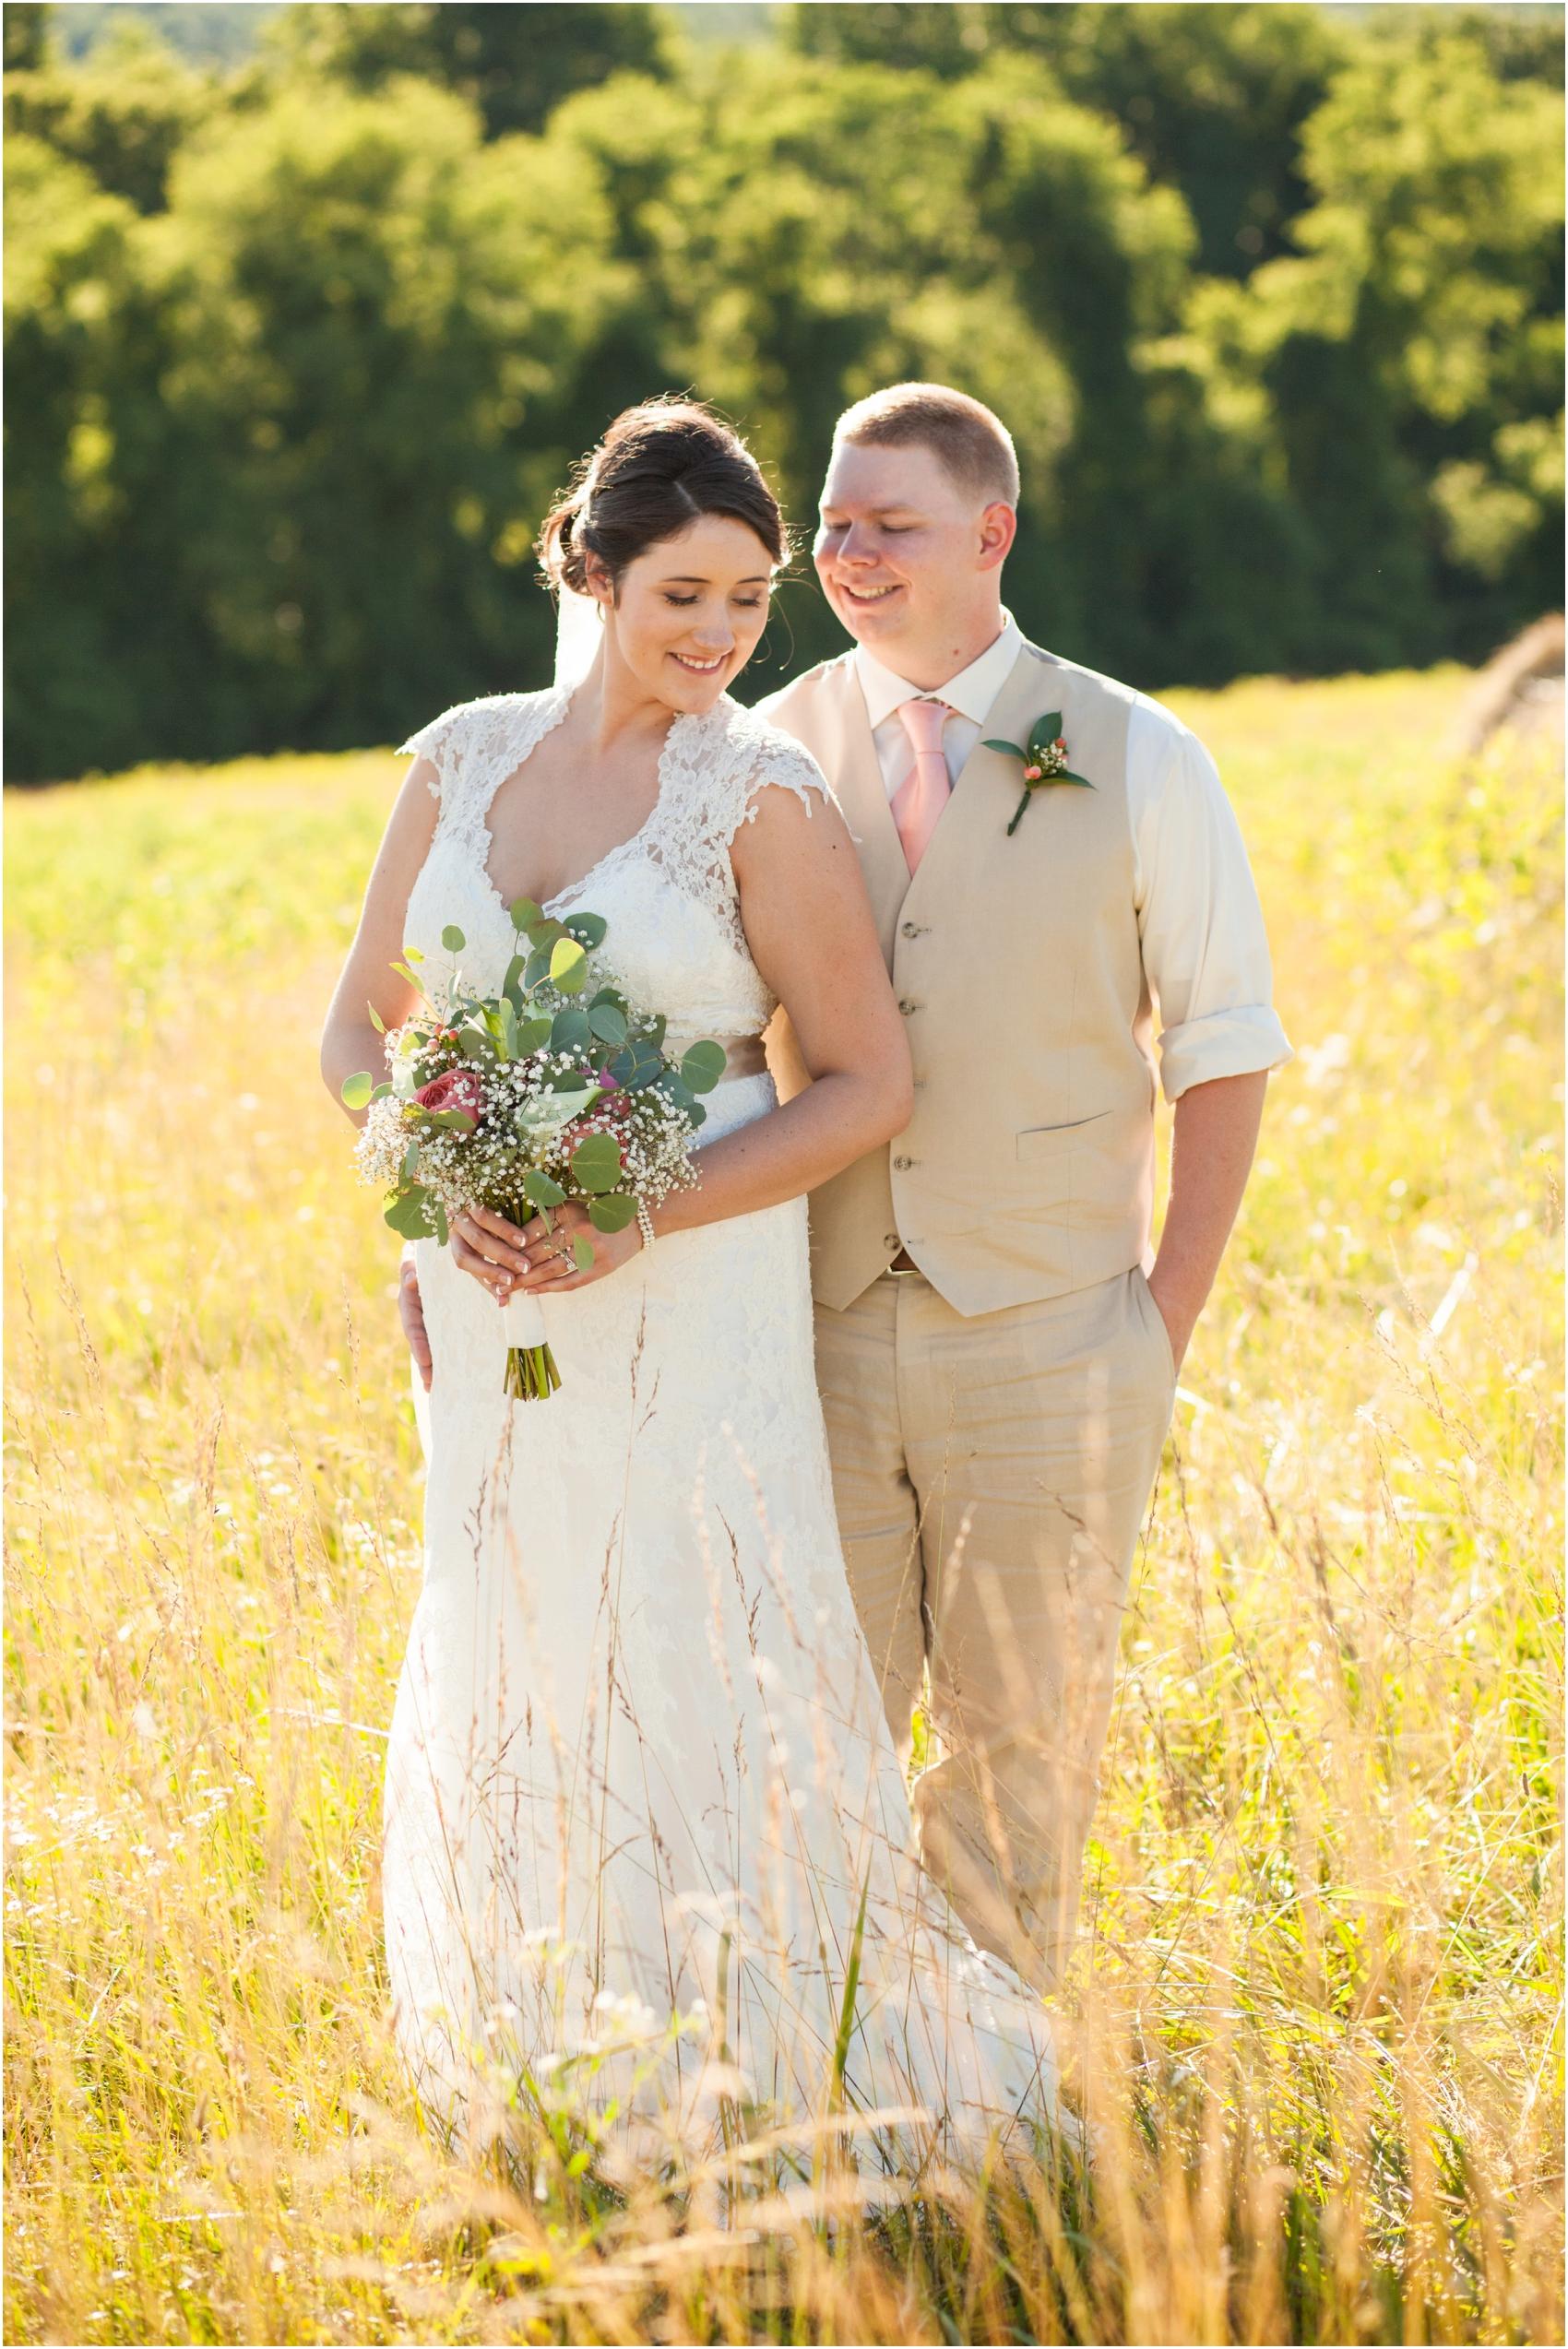 Rodes Farm Charlottesville VA Wedding-9-4.jpg